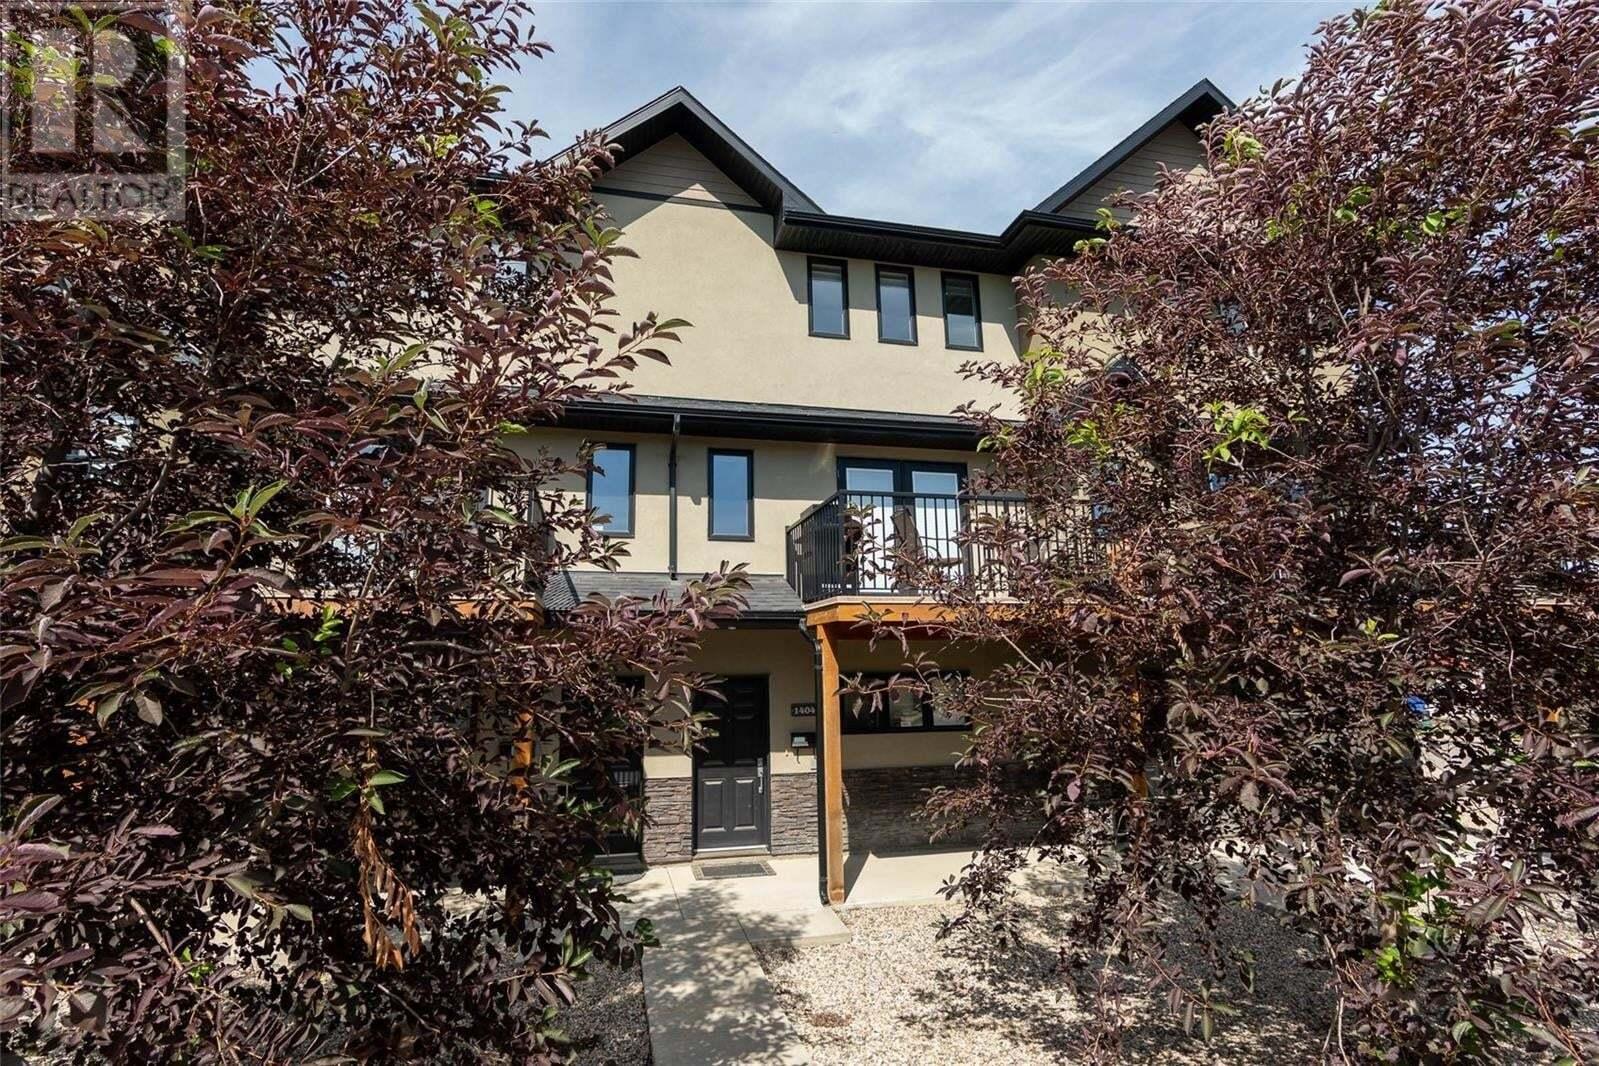 Townhouse for sale at 1404 Mccarthy Blvd Regina Saskatchewan - MLS: SK817261